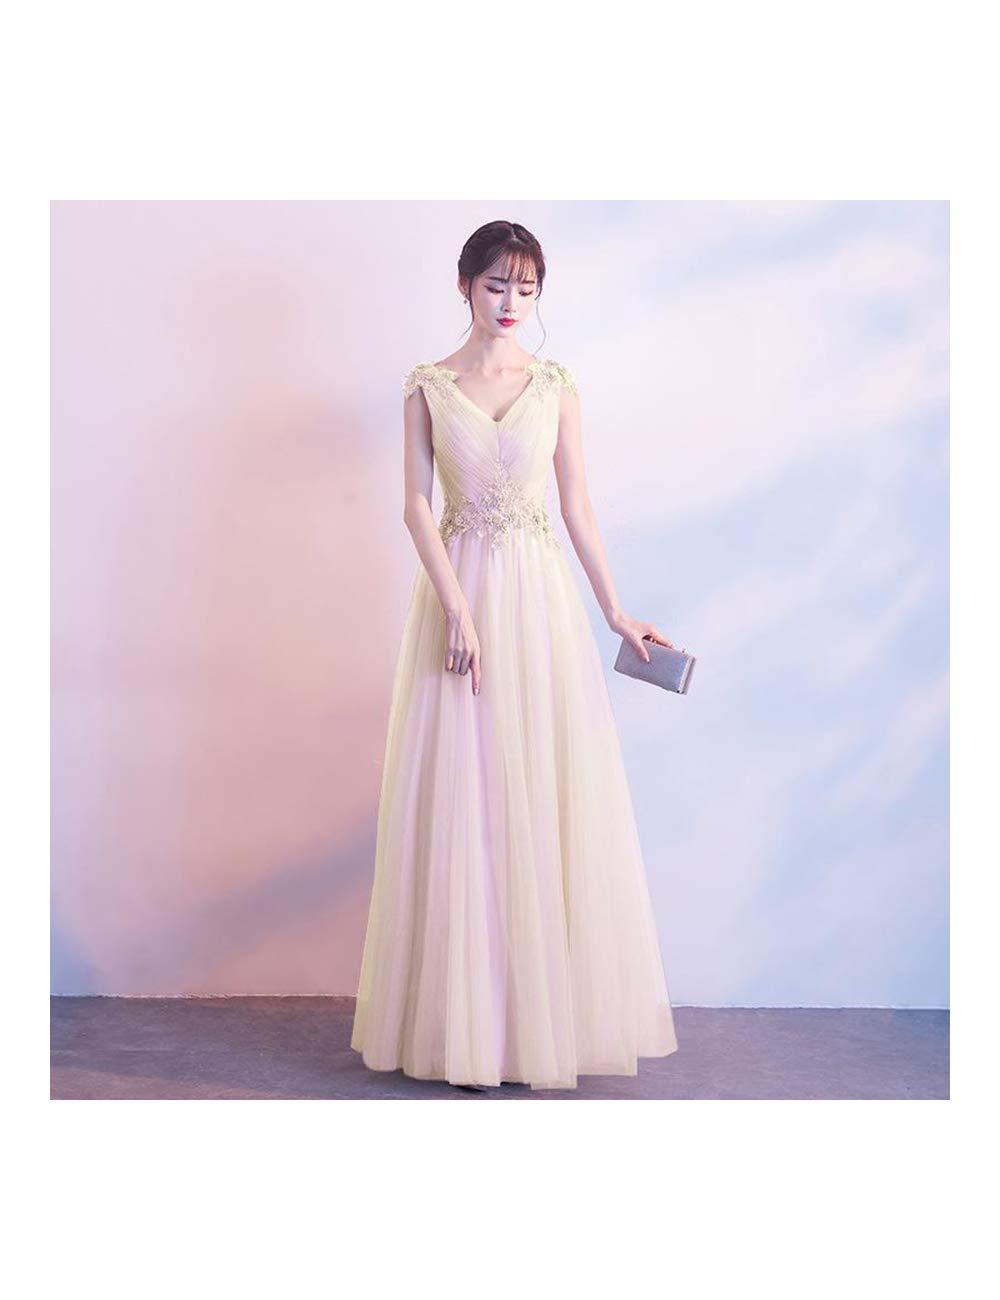 Champagne 1 XS ATLD Cheongsam Robe De Soirée De Mariage élégante Mariée Exquise Dentelle Fleur Strass Cheongsam Col en V sans Manches Qipao